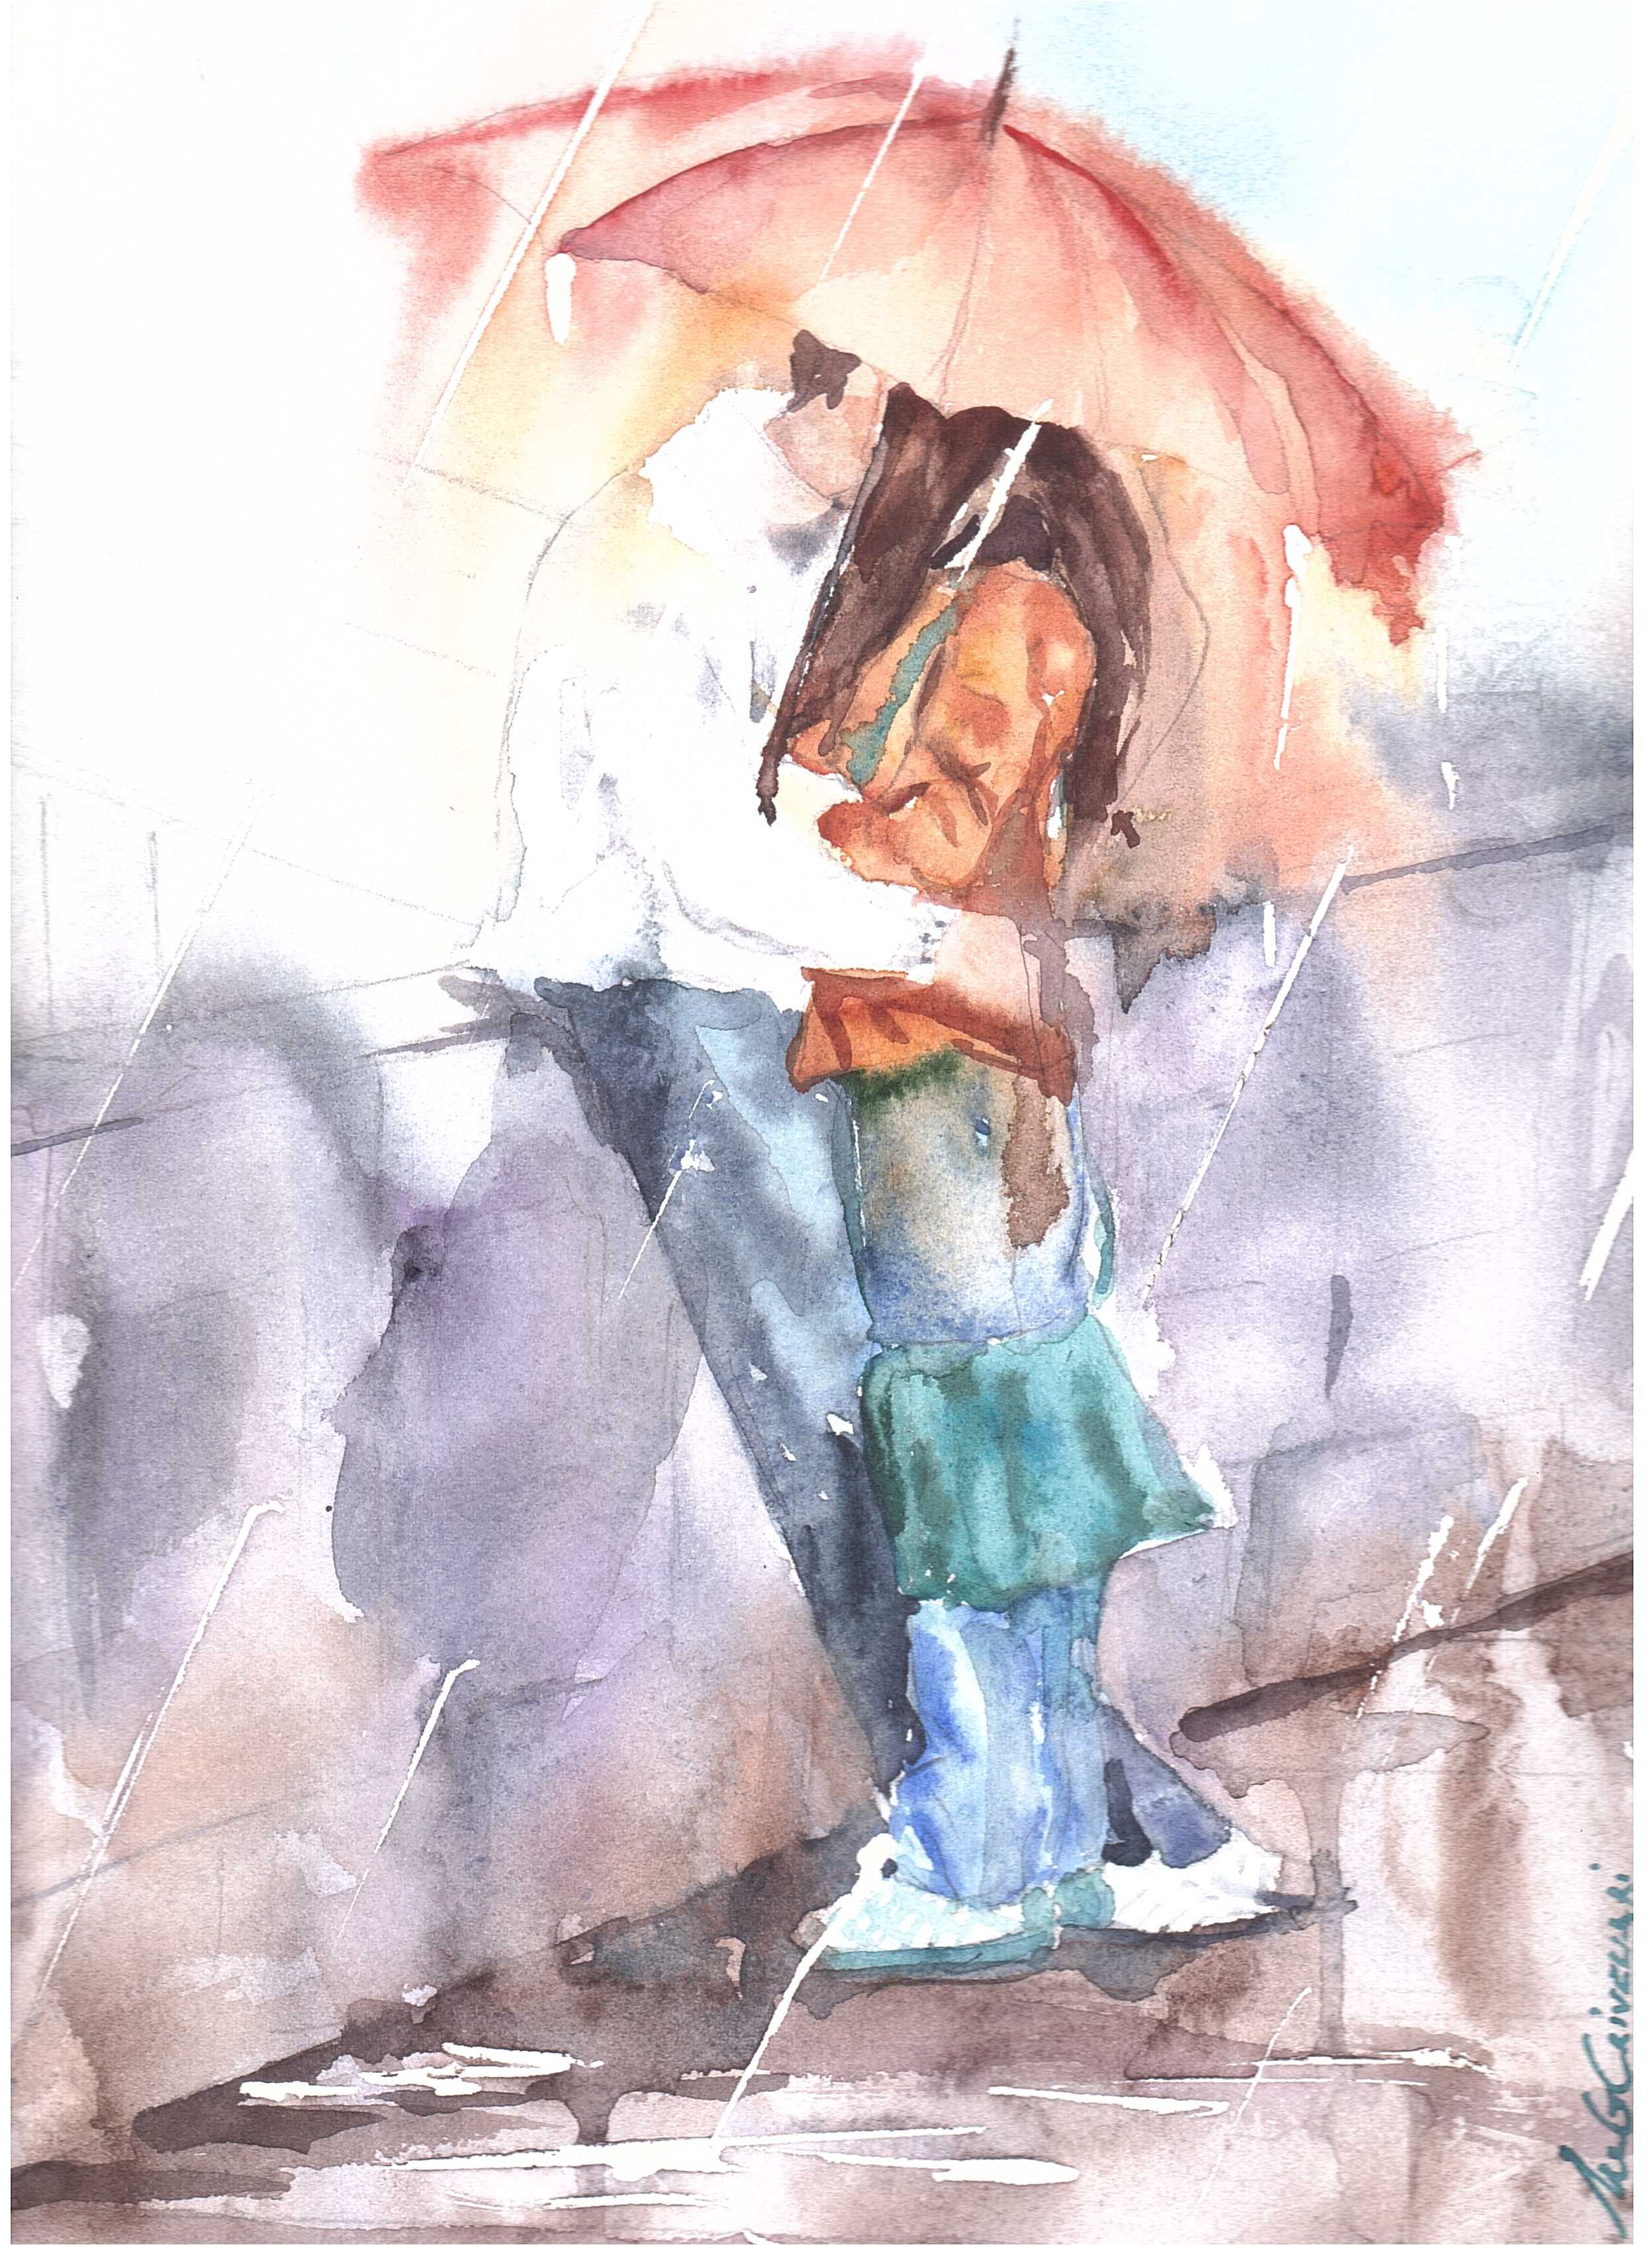 Nro.207 Autor: Ma. Graciela Crivellari